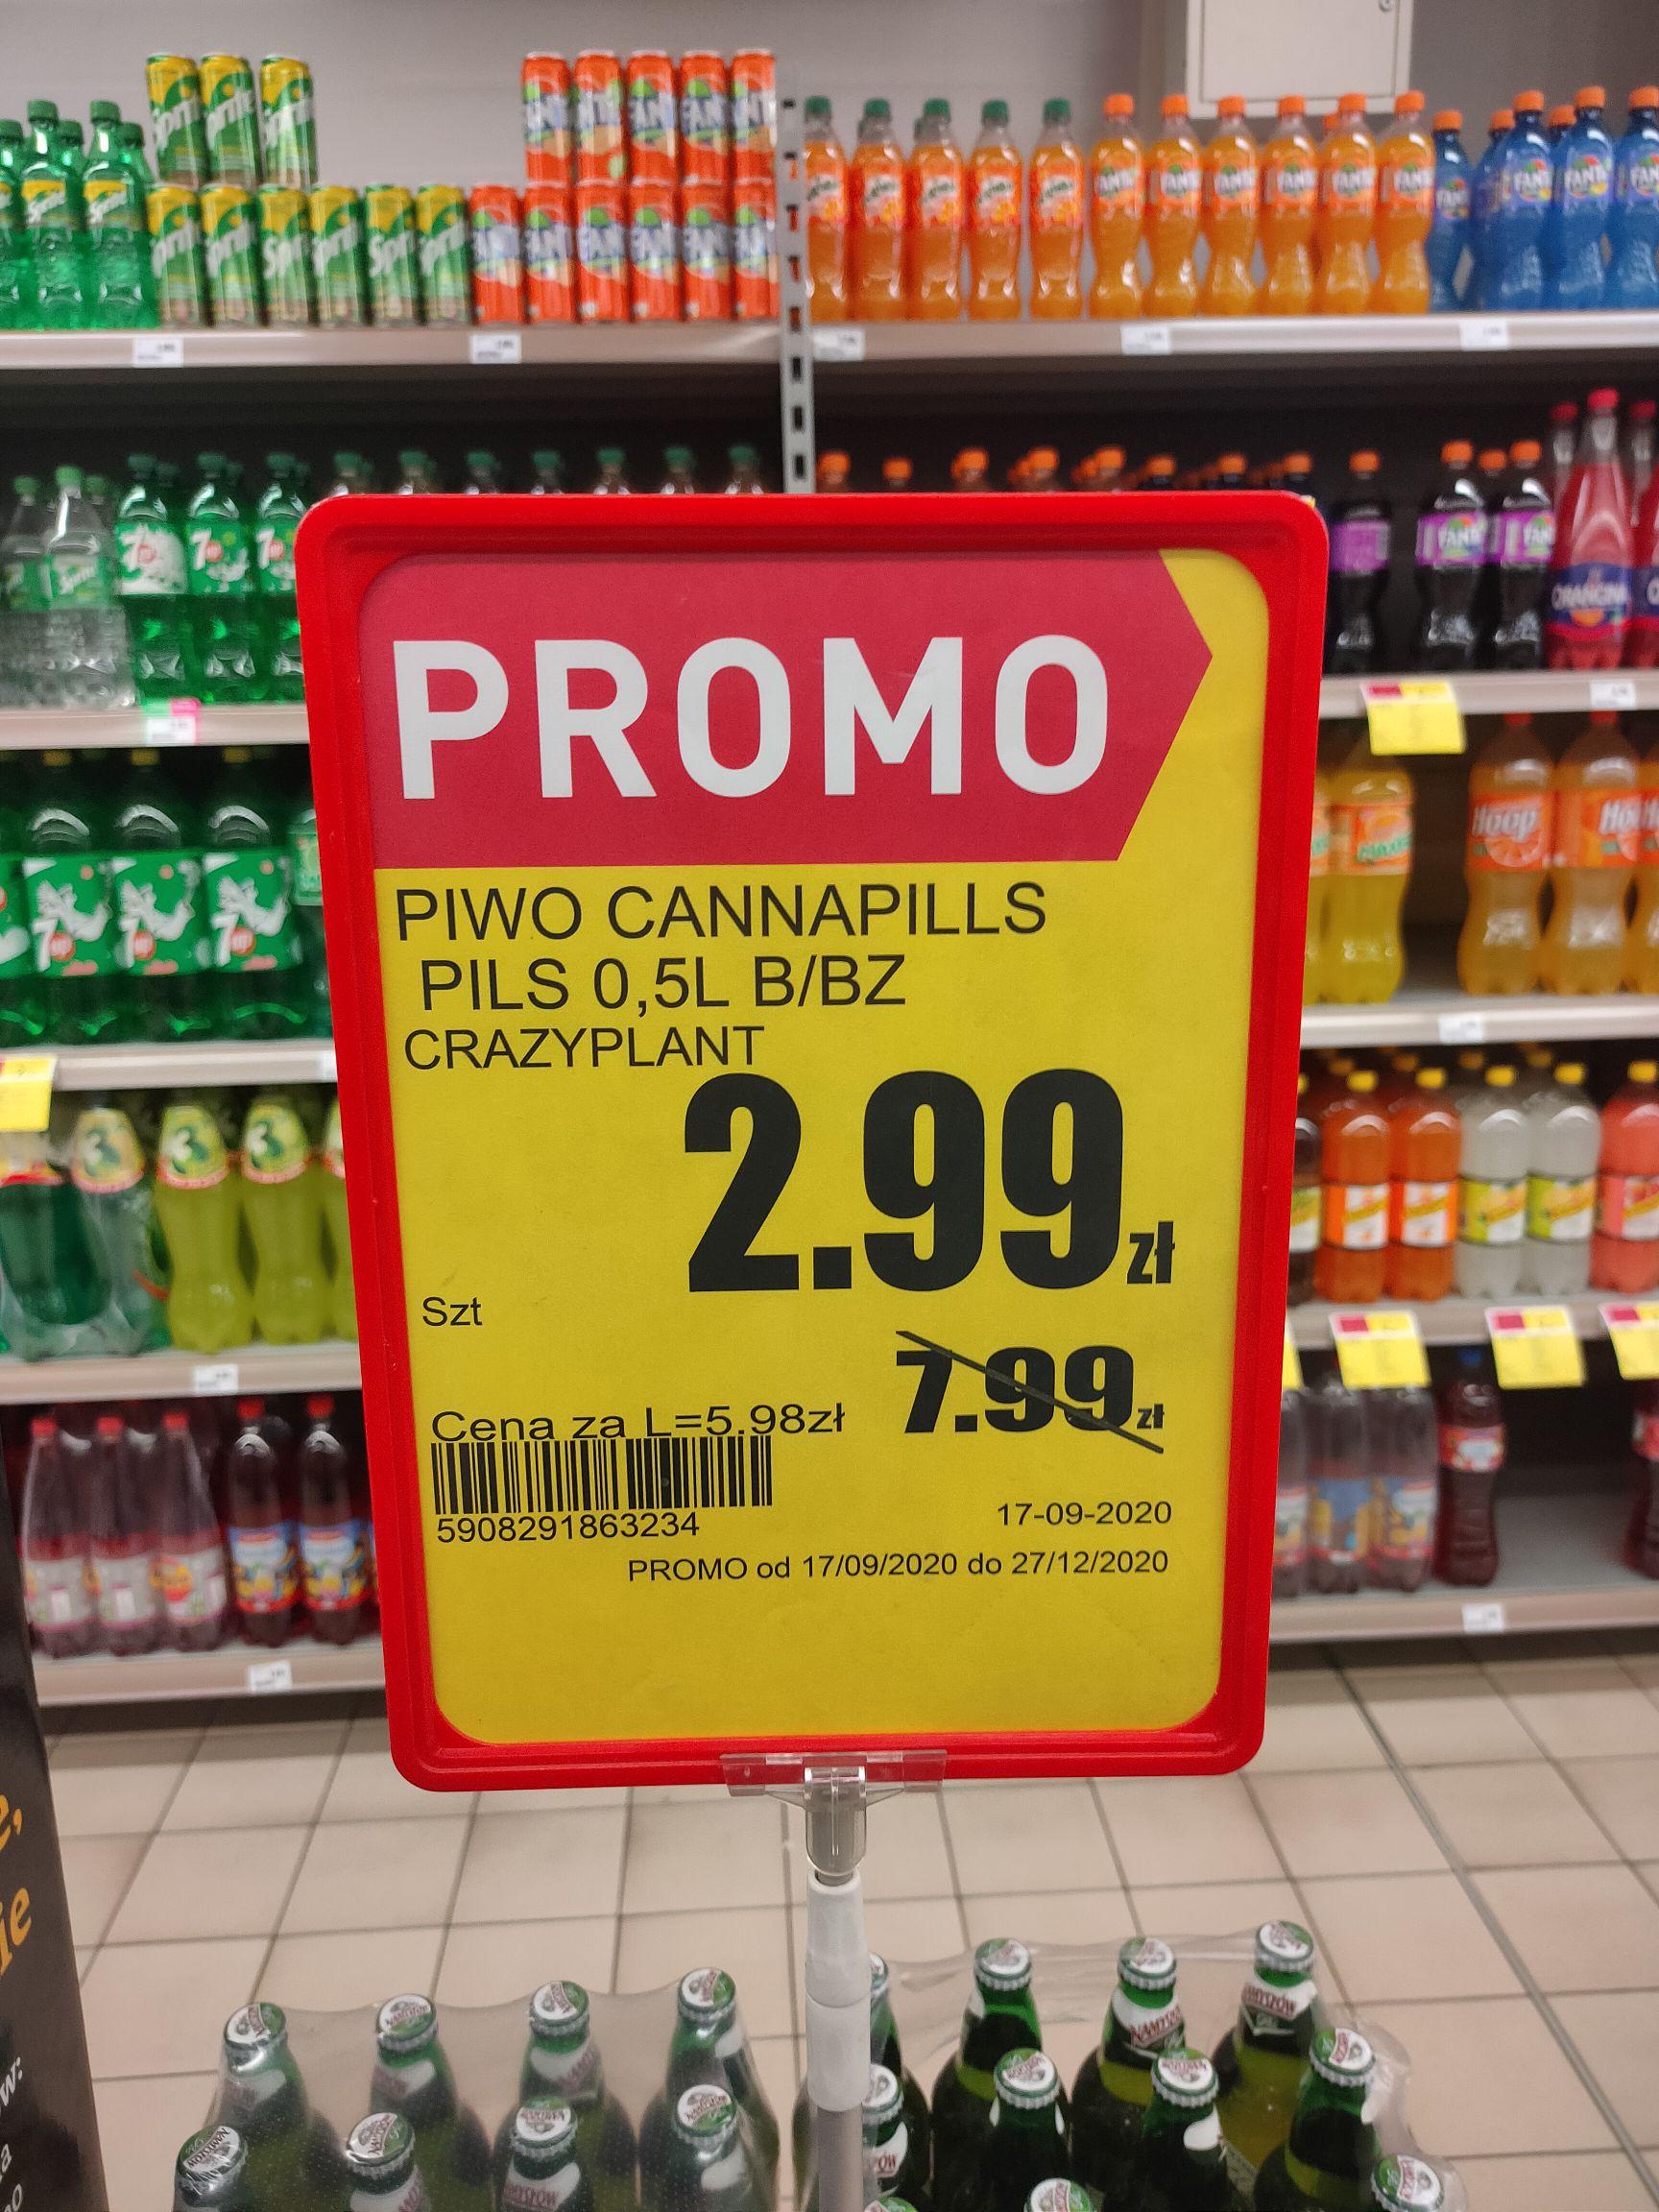 Piwo Cannapills 2.99 @ Intermarche